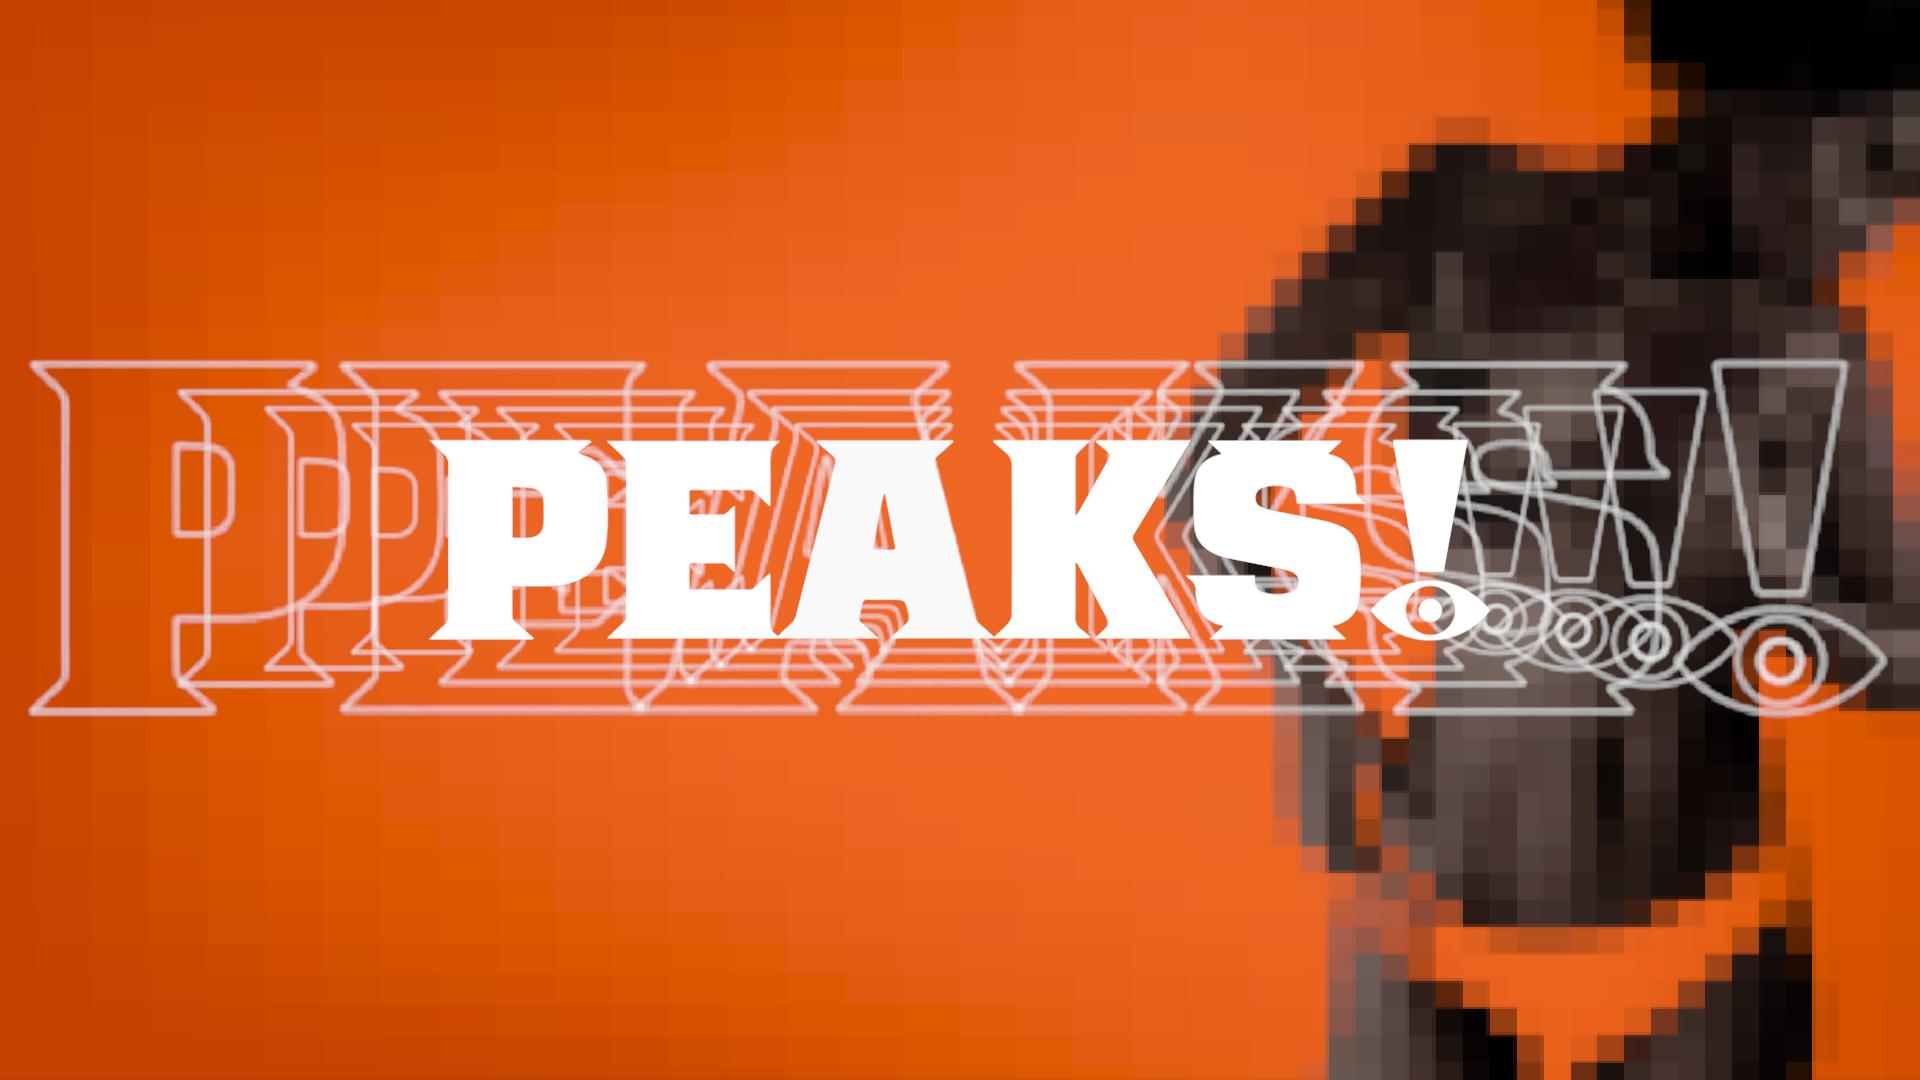 Blackout PEAKS! 05